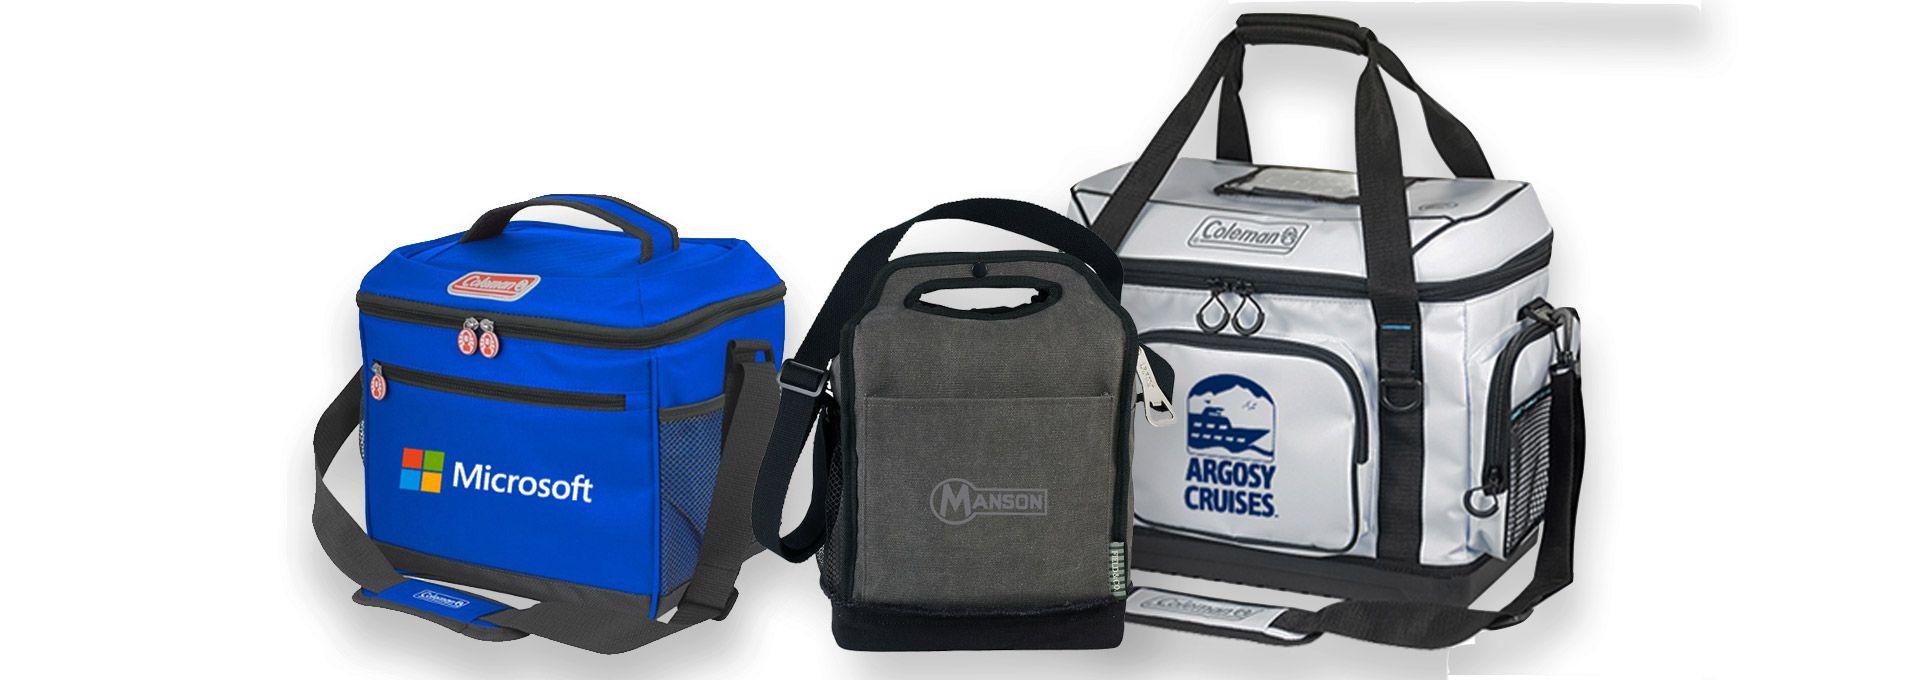 Custom Printed Promotional Coolers Seattle